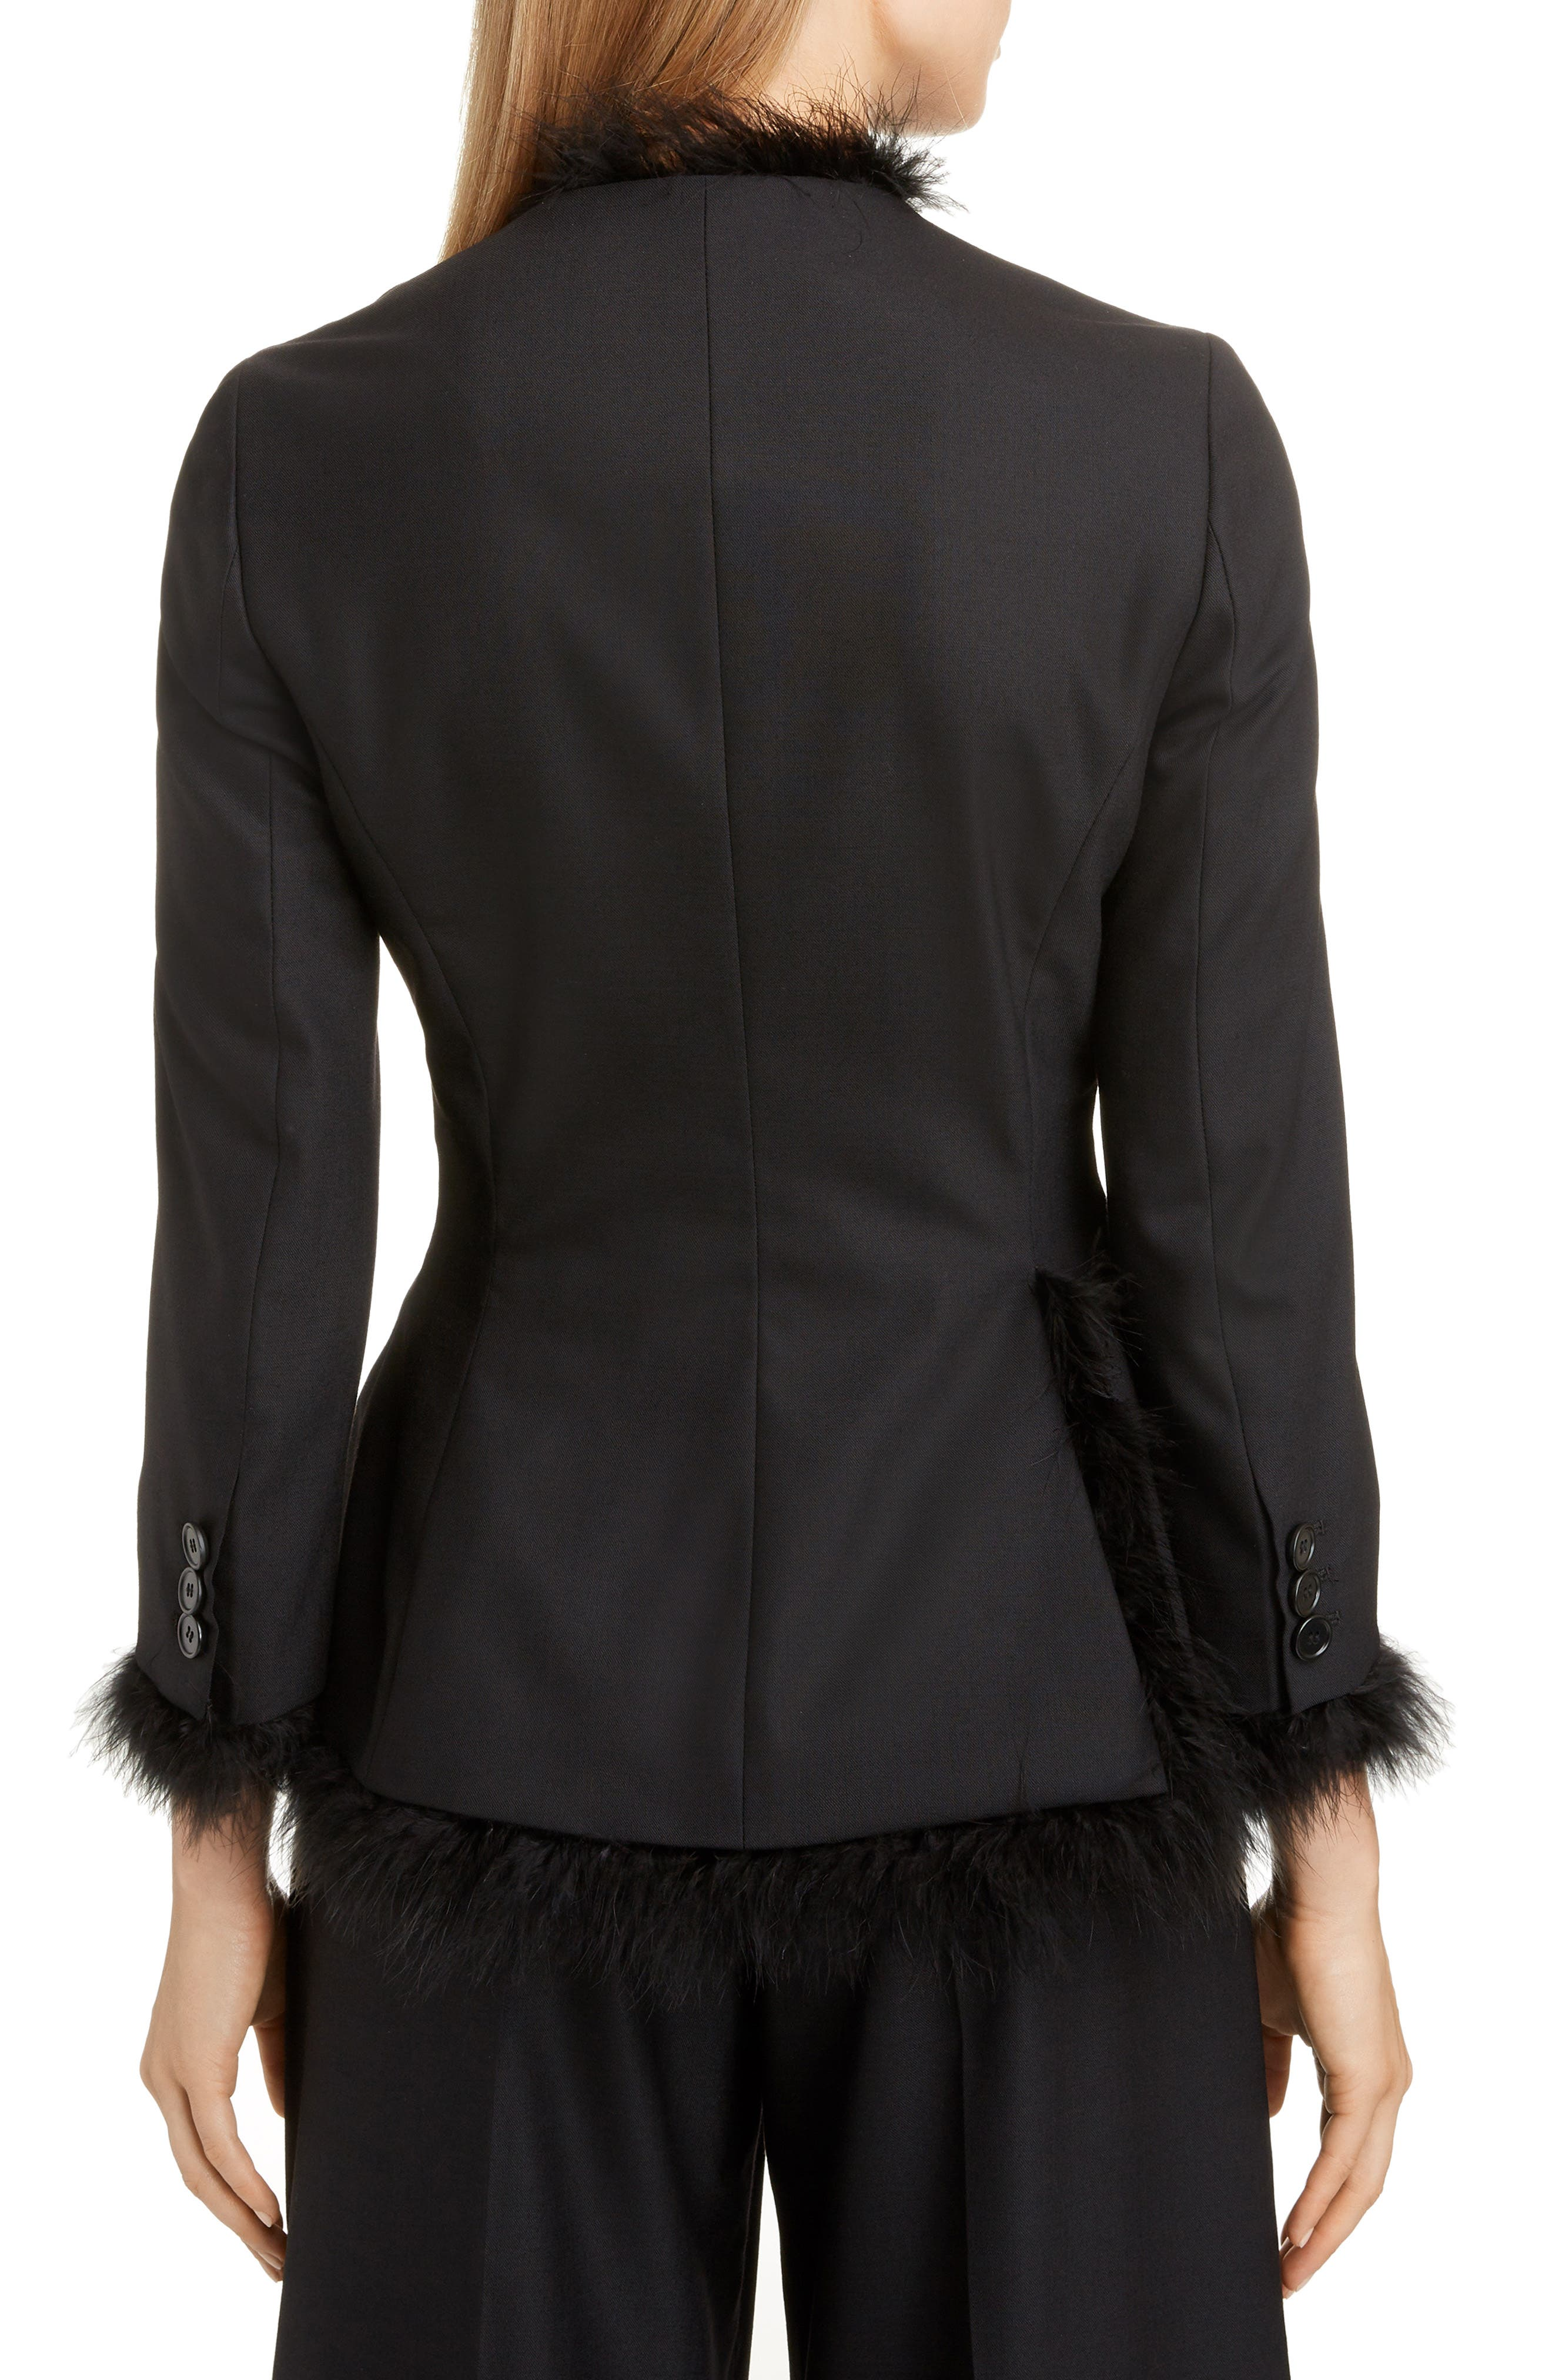 SIMONE ROCHA,                             Marabou Trim Double Breasted Stretch Wool Jacket,                             Alternate thumbnail 2, color,                             BLACK